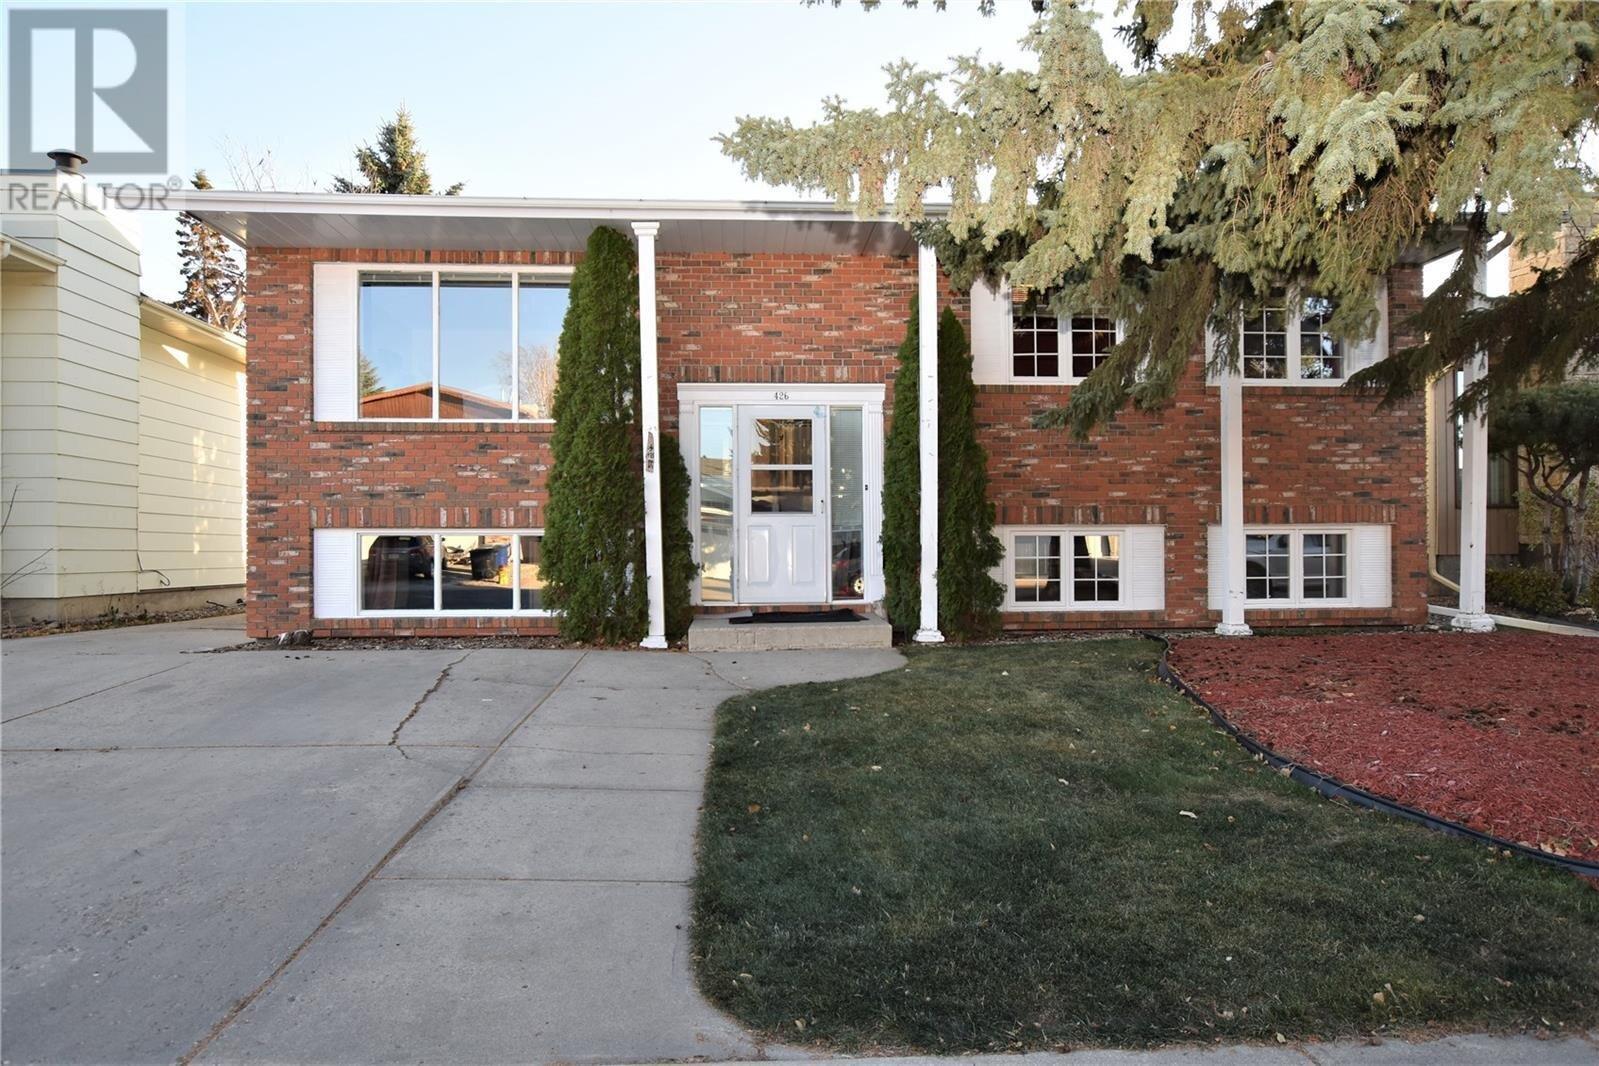 House for sale at 426 Crean Ln Saskatoon Saskatchewan - MLS: SK831456